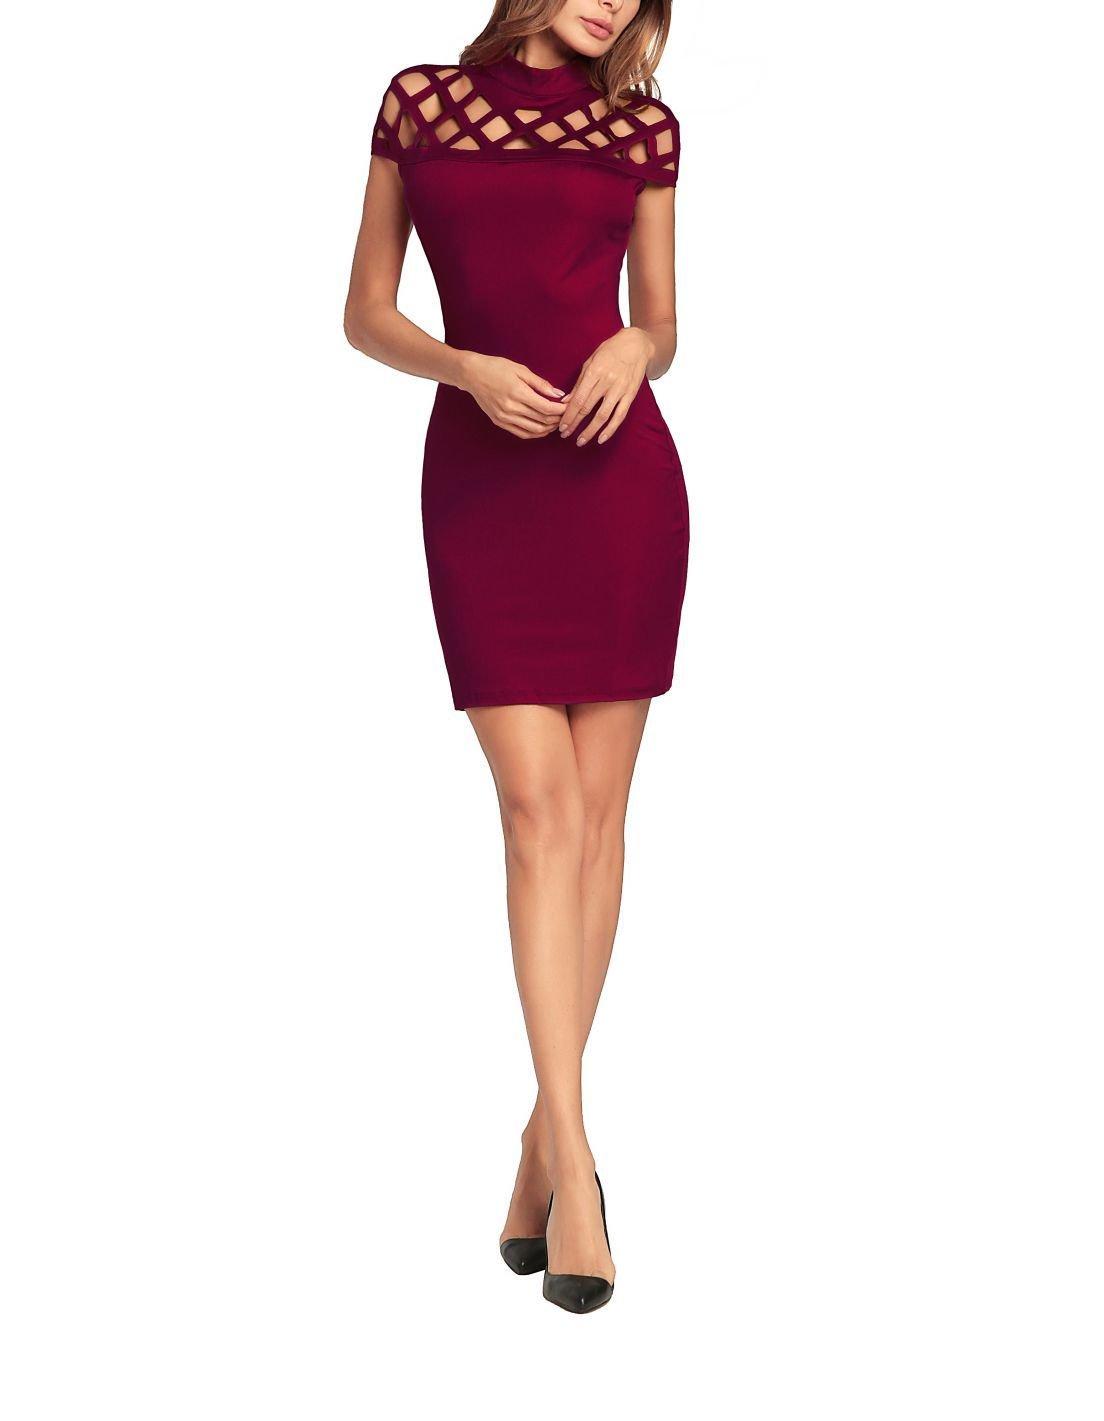 Short Cocktail Dress with Lattice Yoke